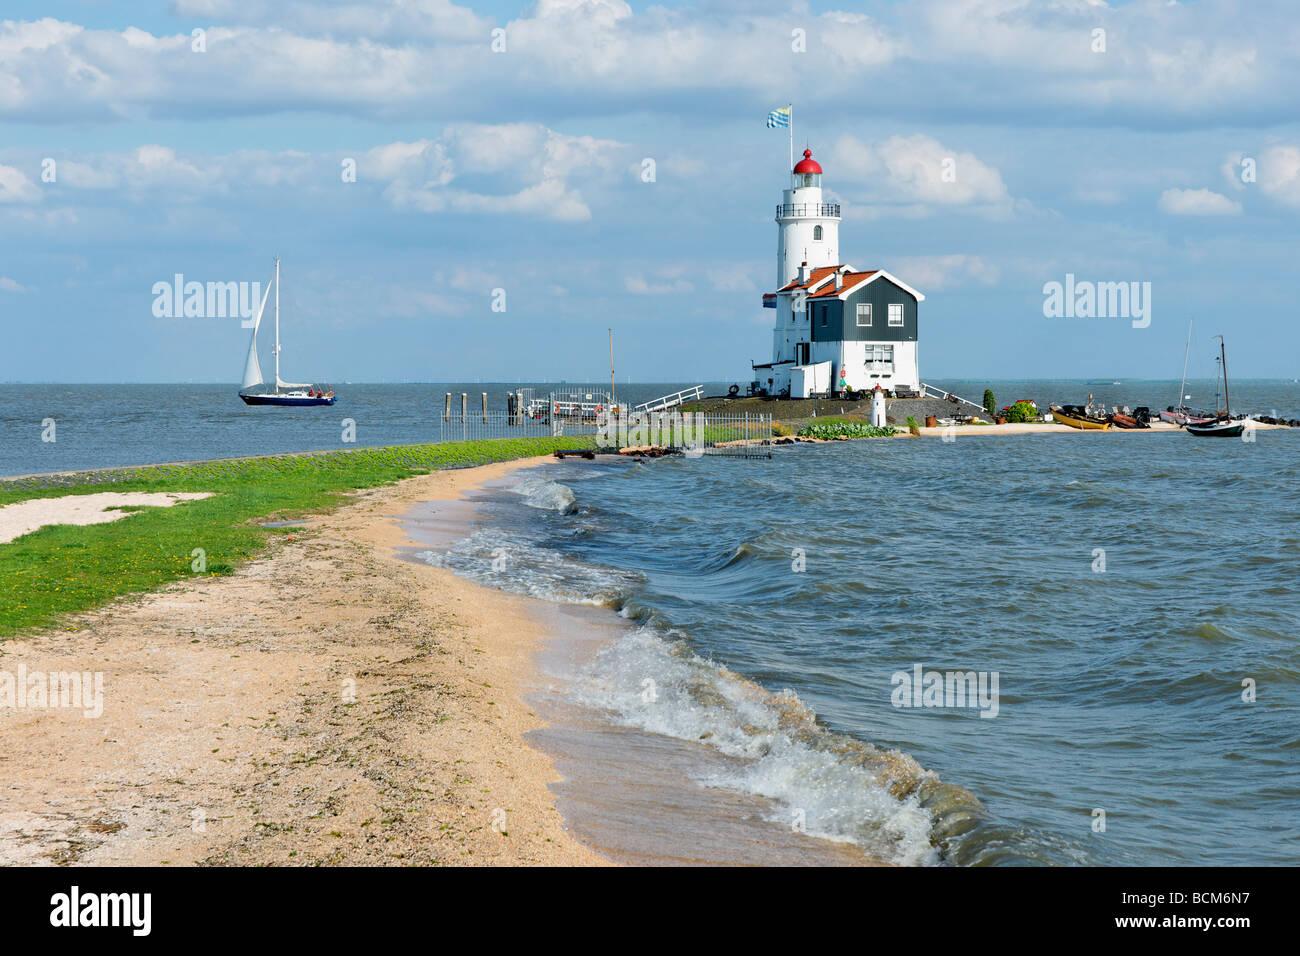 Het Paard van Marken Lighthouse, Marken, North Holland, Netherlands. - Stock Image